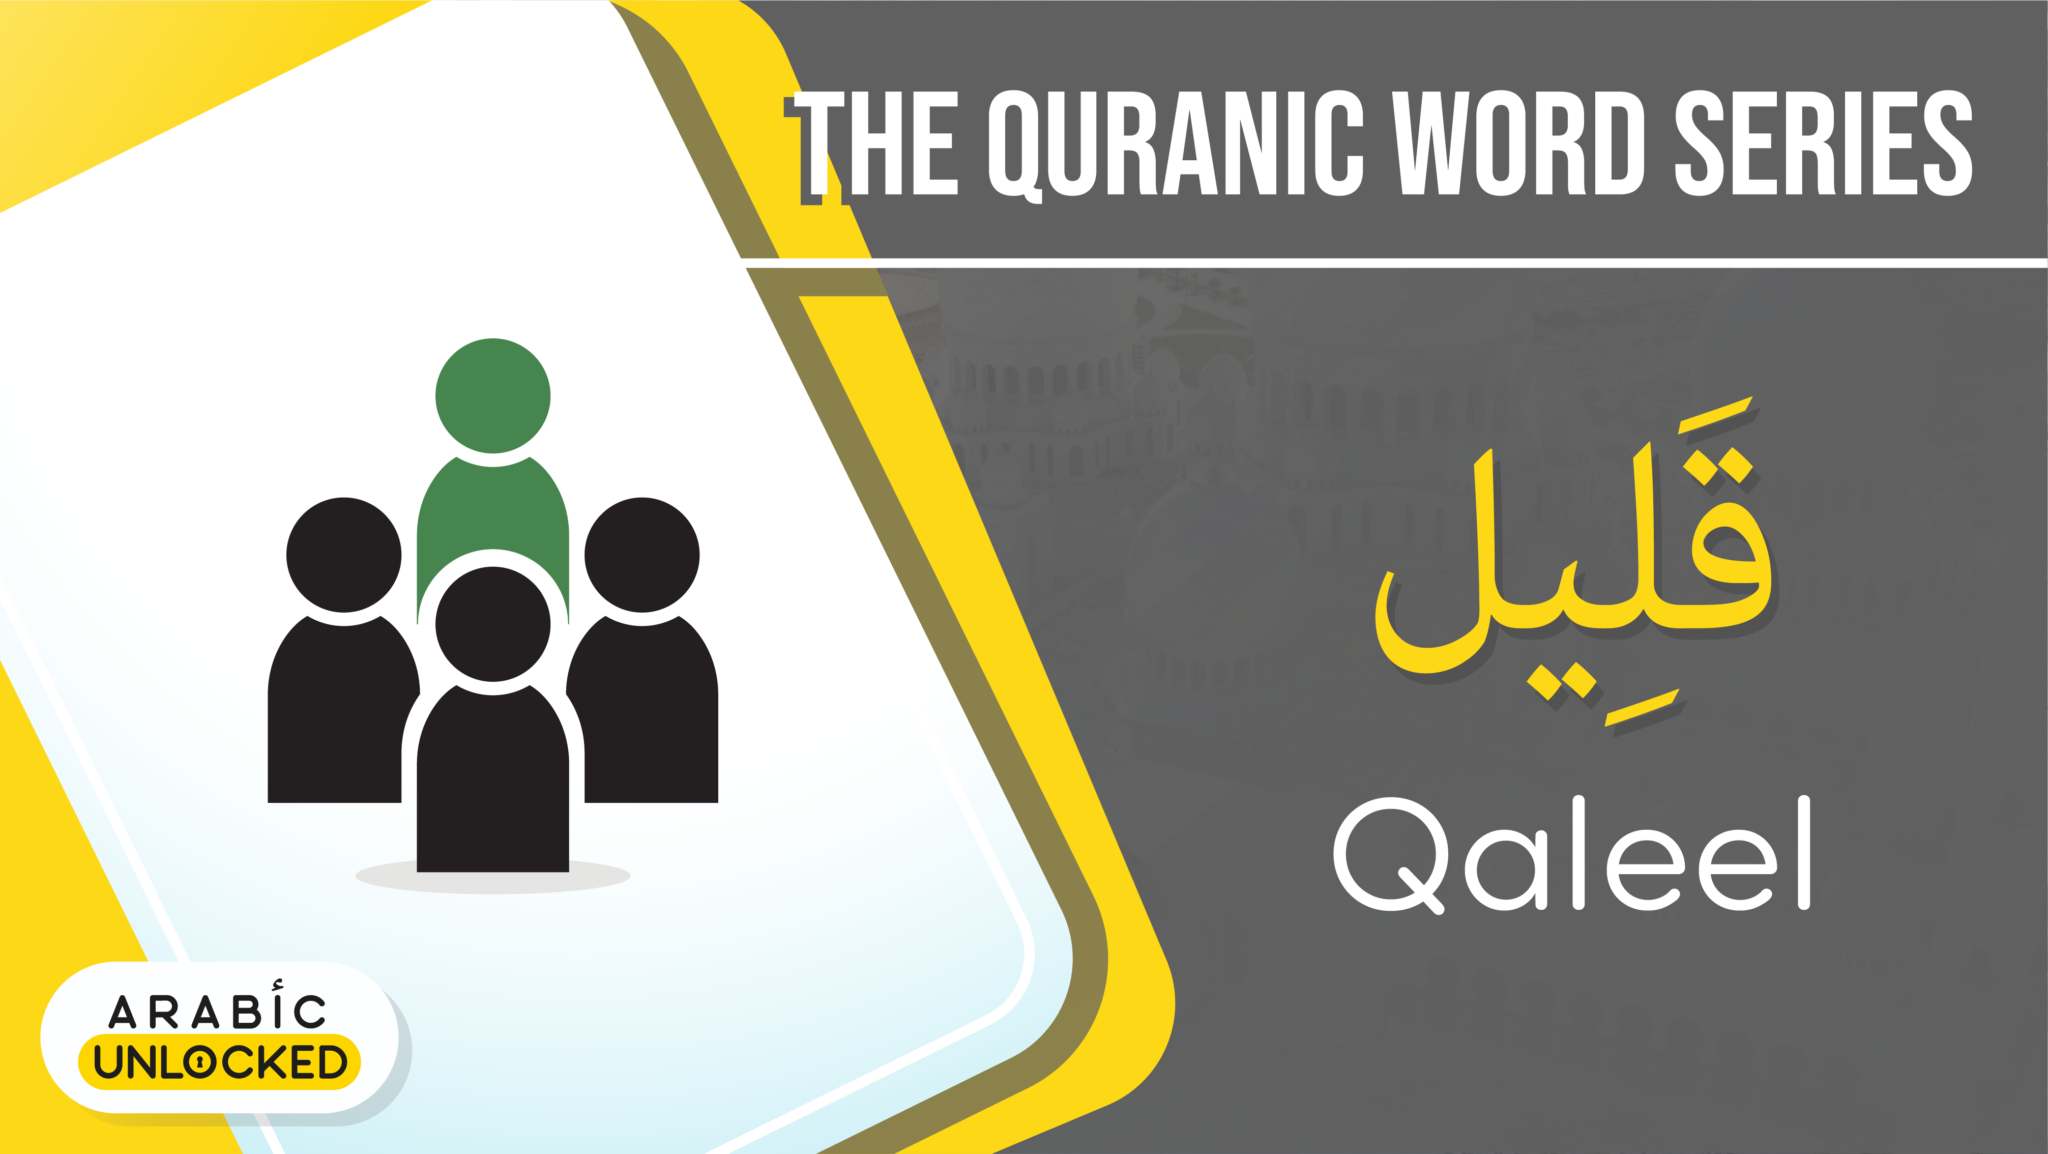 Quranic Word Series: Qaleel